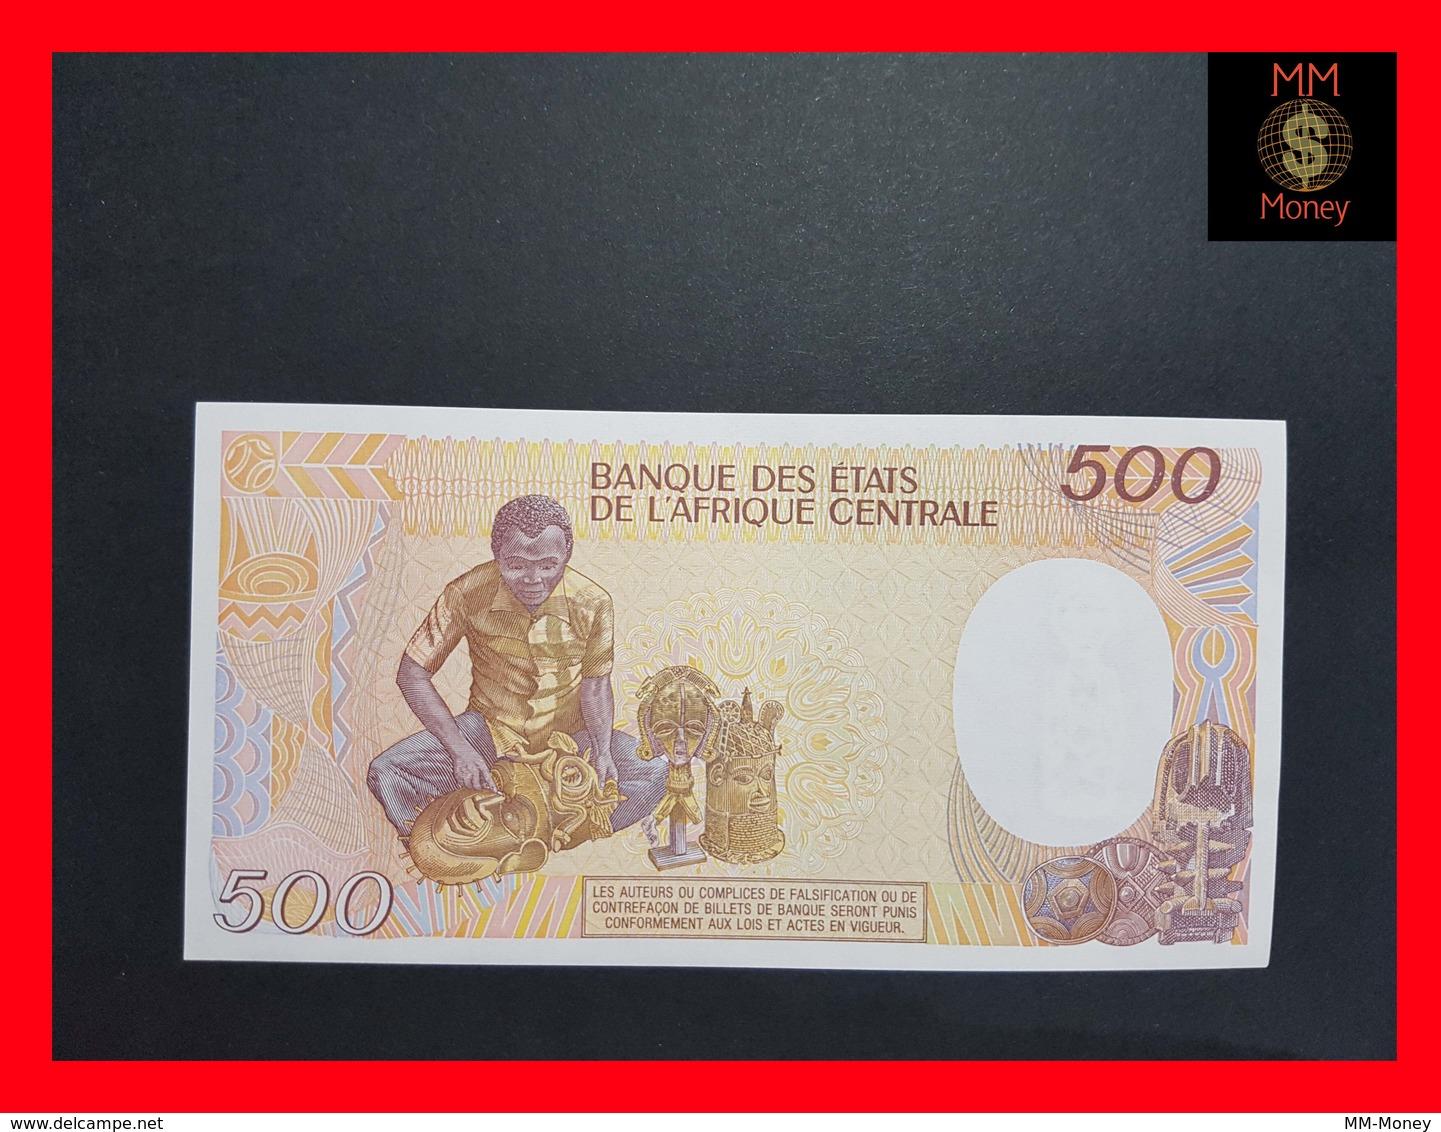 Central African Republic 500 Francs 1987 P. 14 UNC - Central African Republic